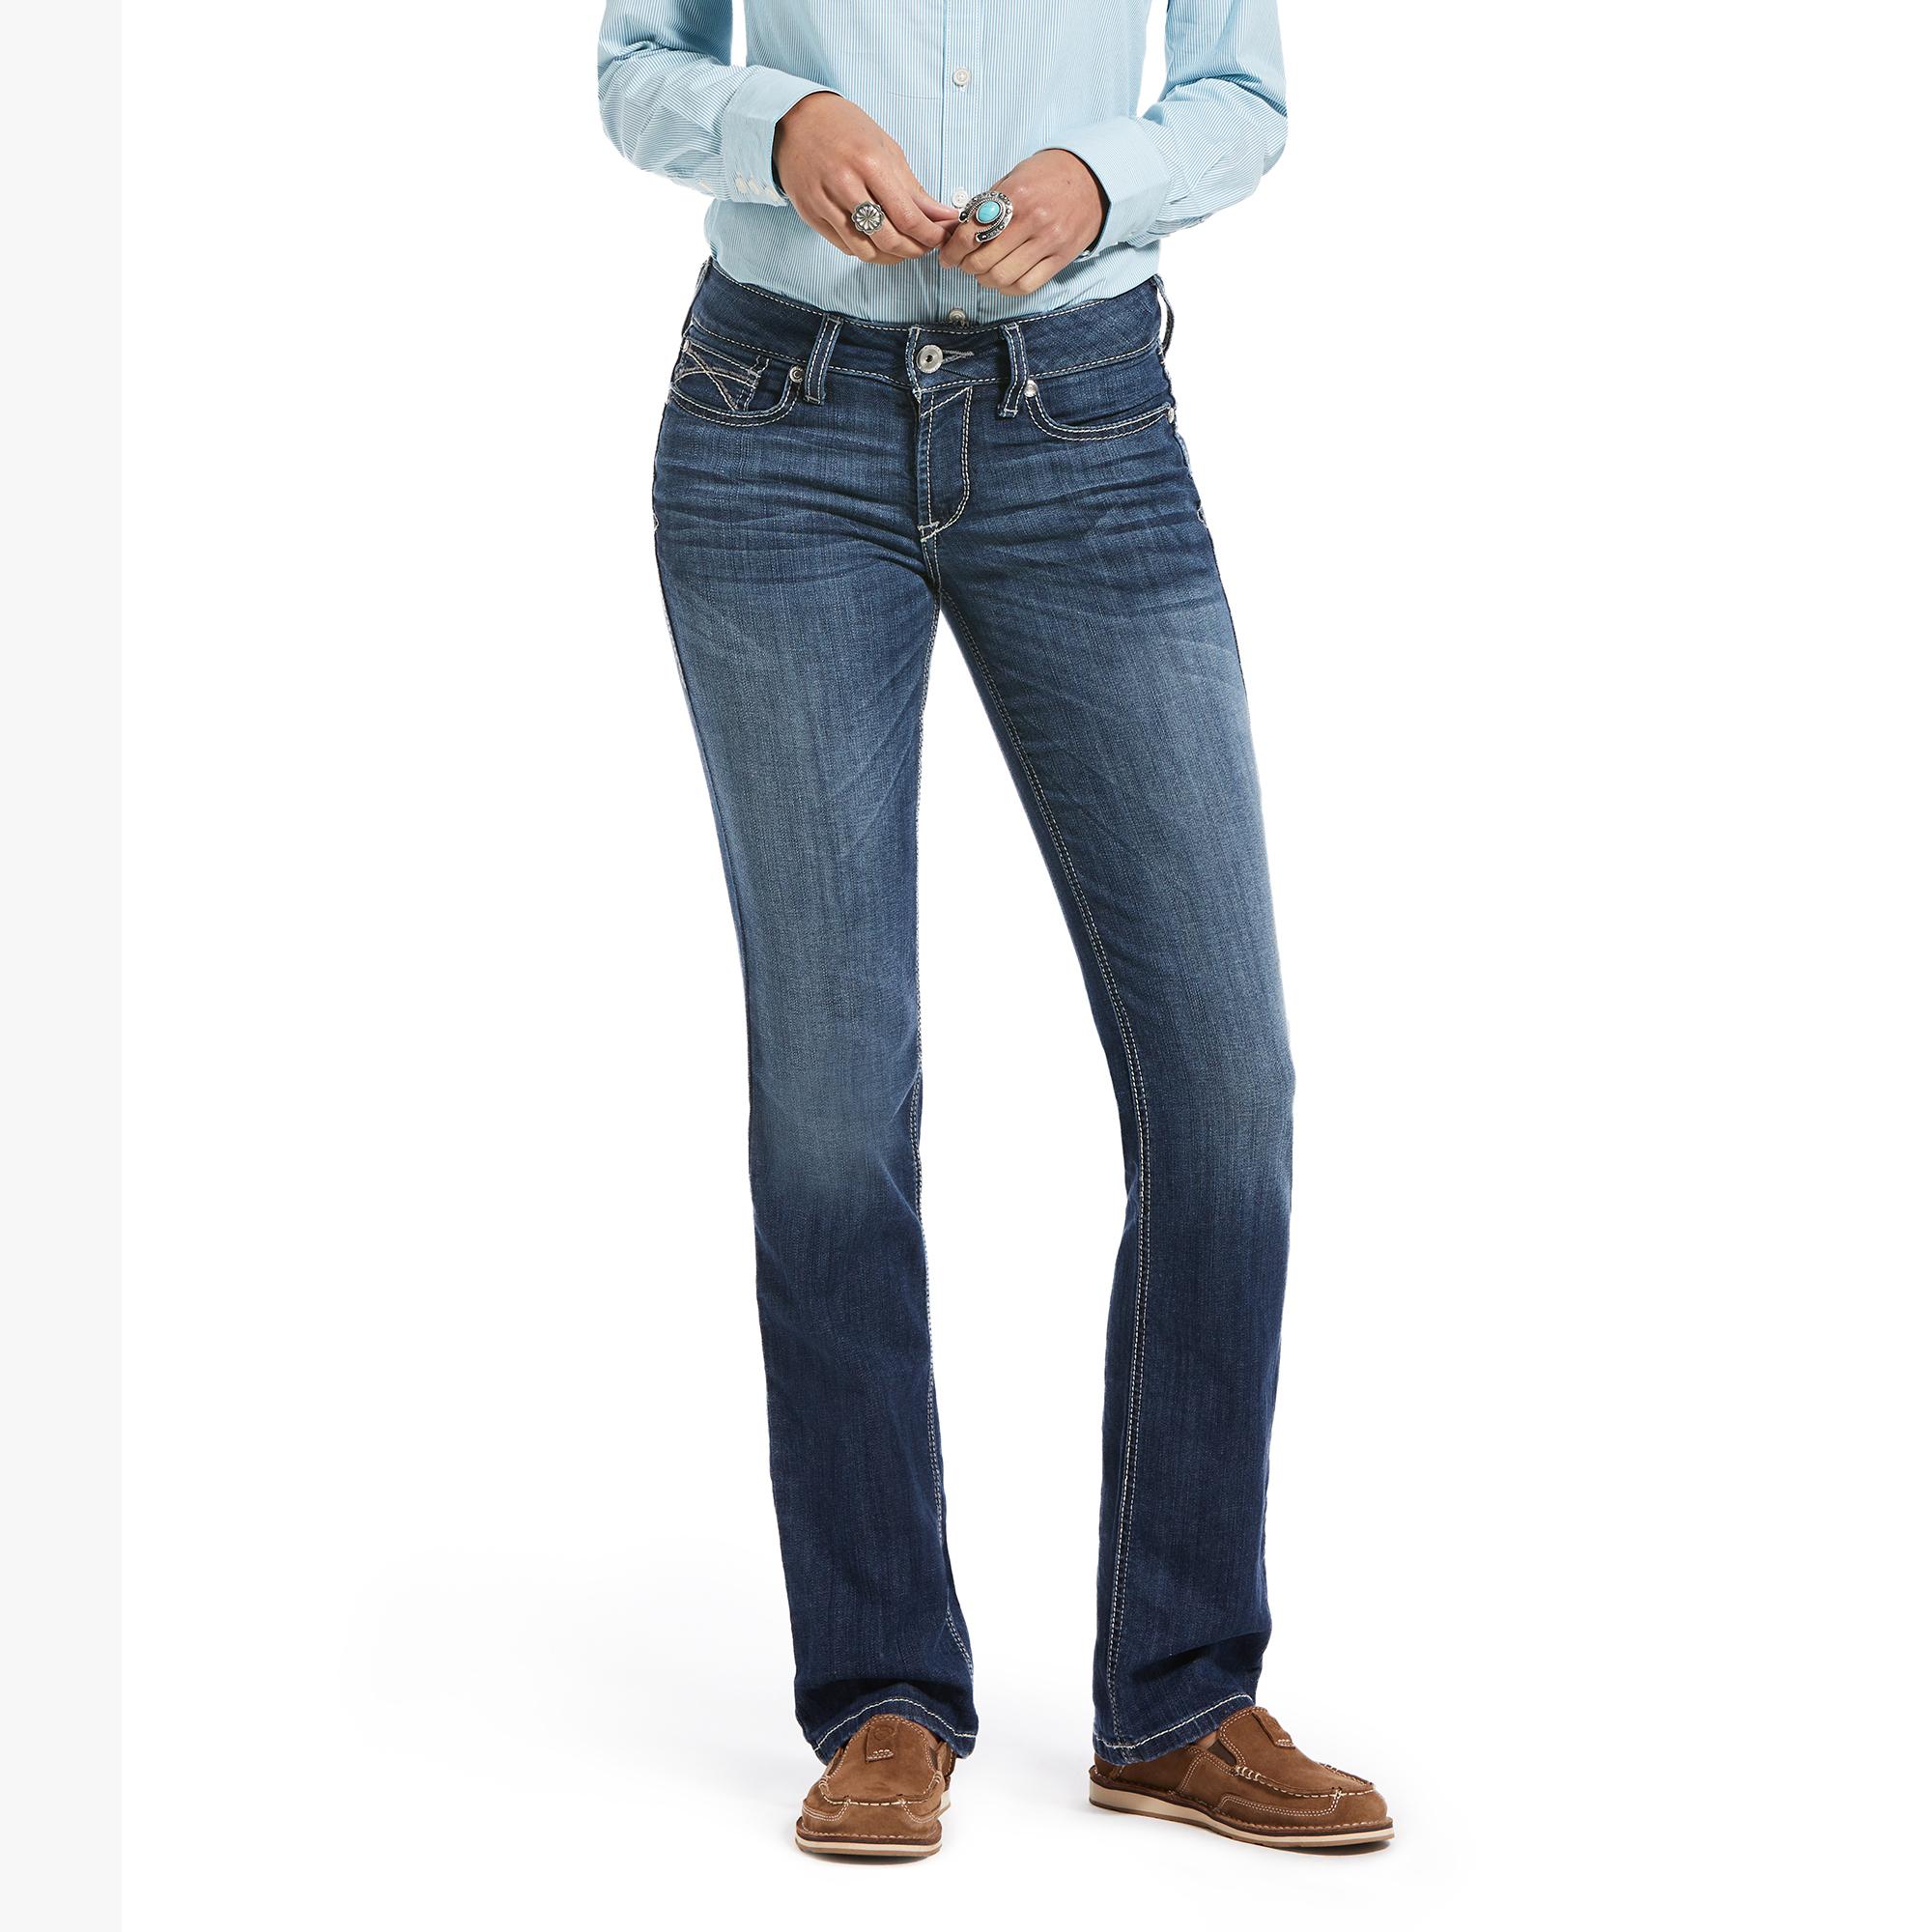 jeans-western-ariat-femme-skyway (3)